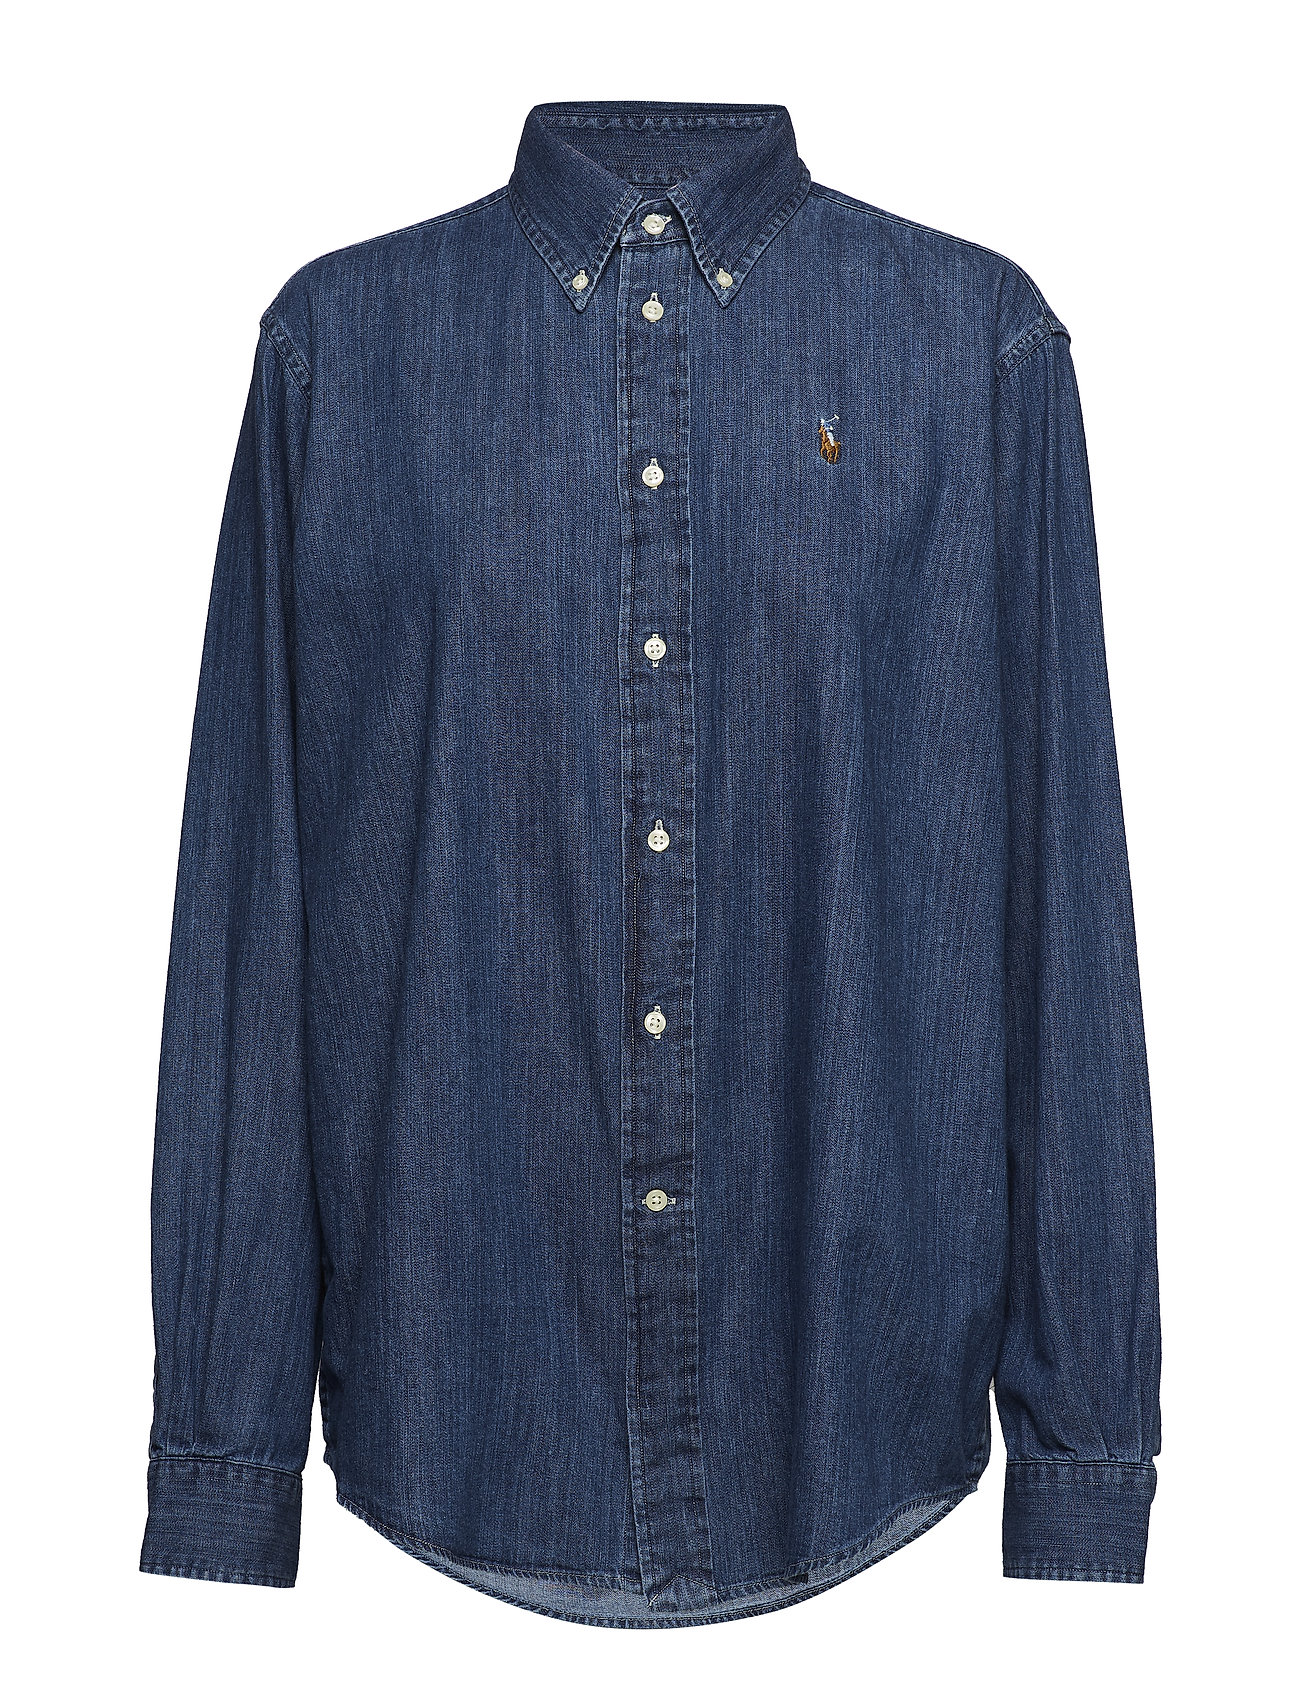 Polo Ralph Lauren Chambray Big Shirt